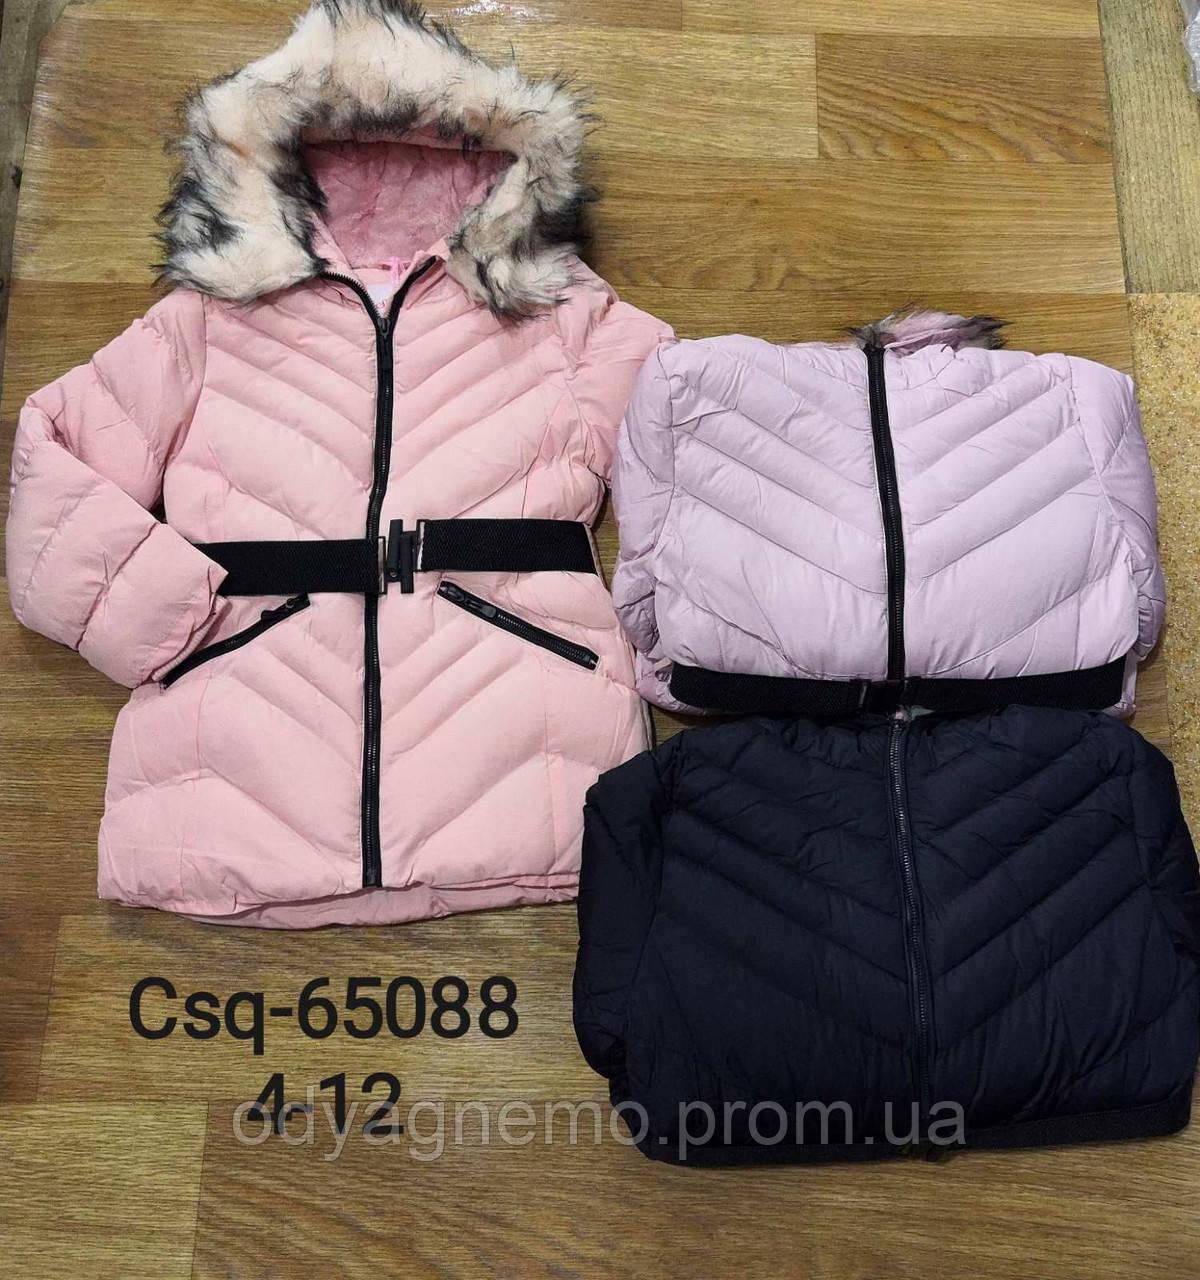 Куртка на меху для девочек Seagull, 4-12 лет. Артикул: CSQ65088